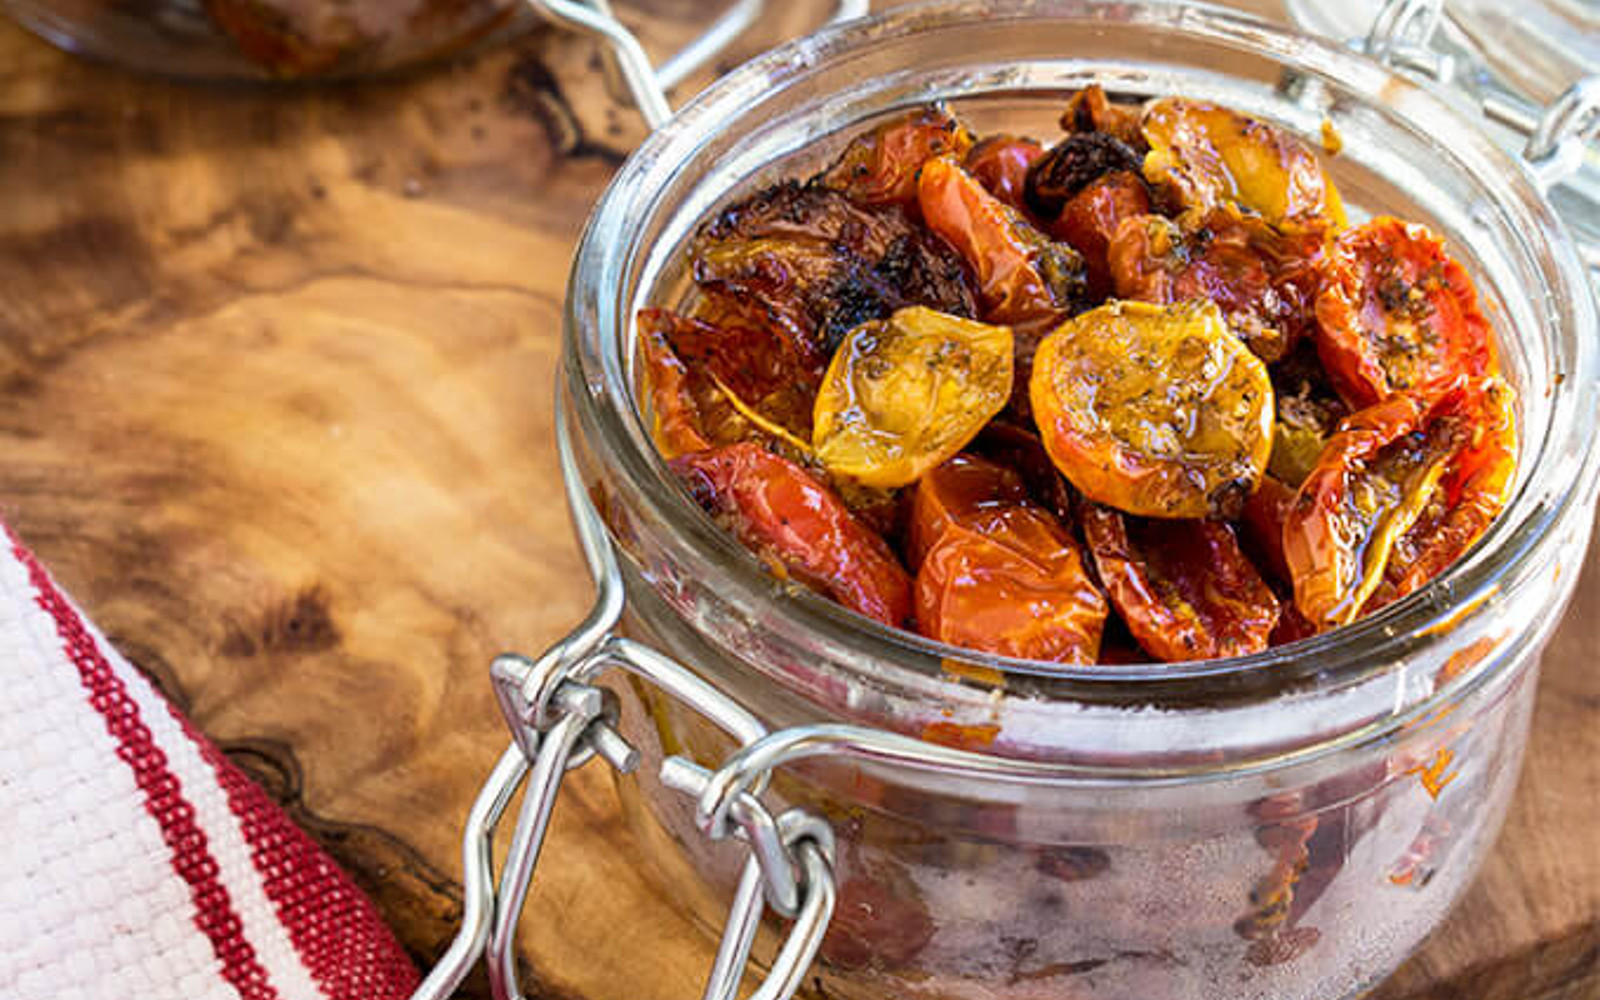 Vegan Gluten-Free Slow-Roasted Garlic and Herb Tomatoes in storage jar